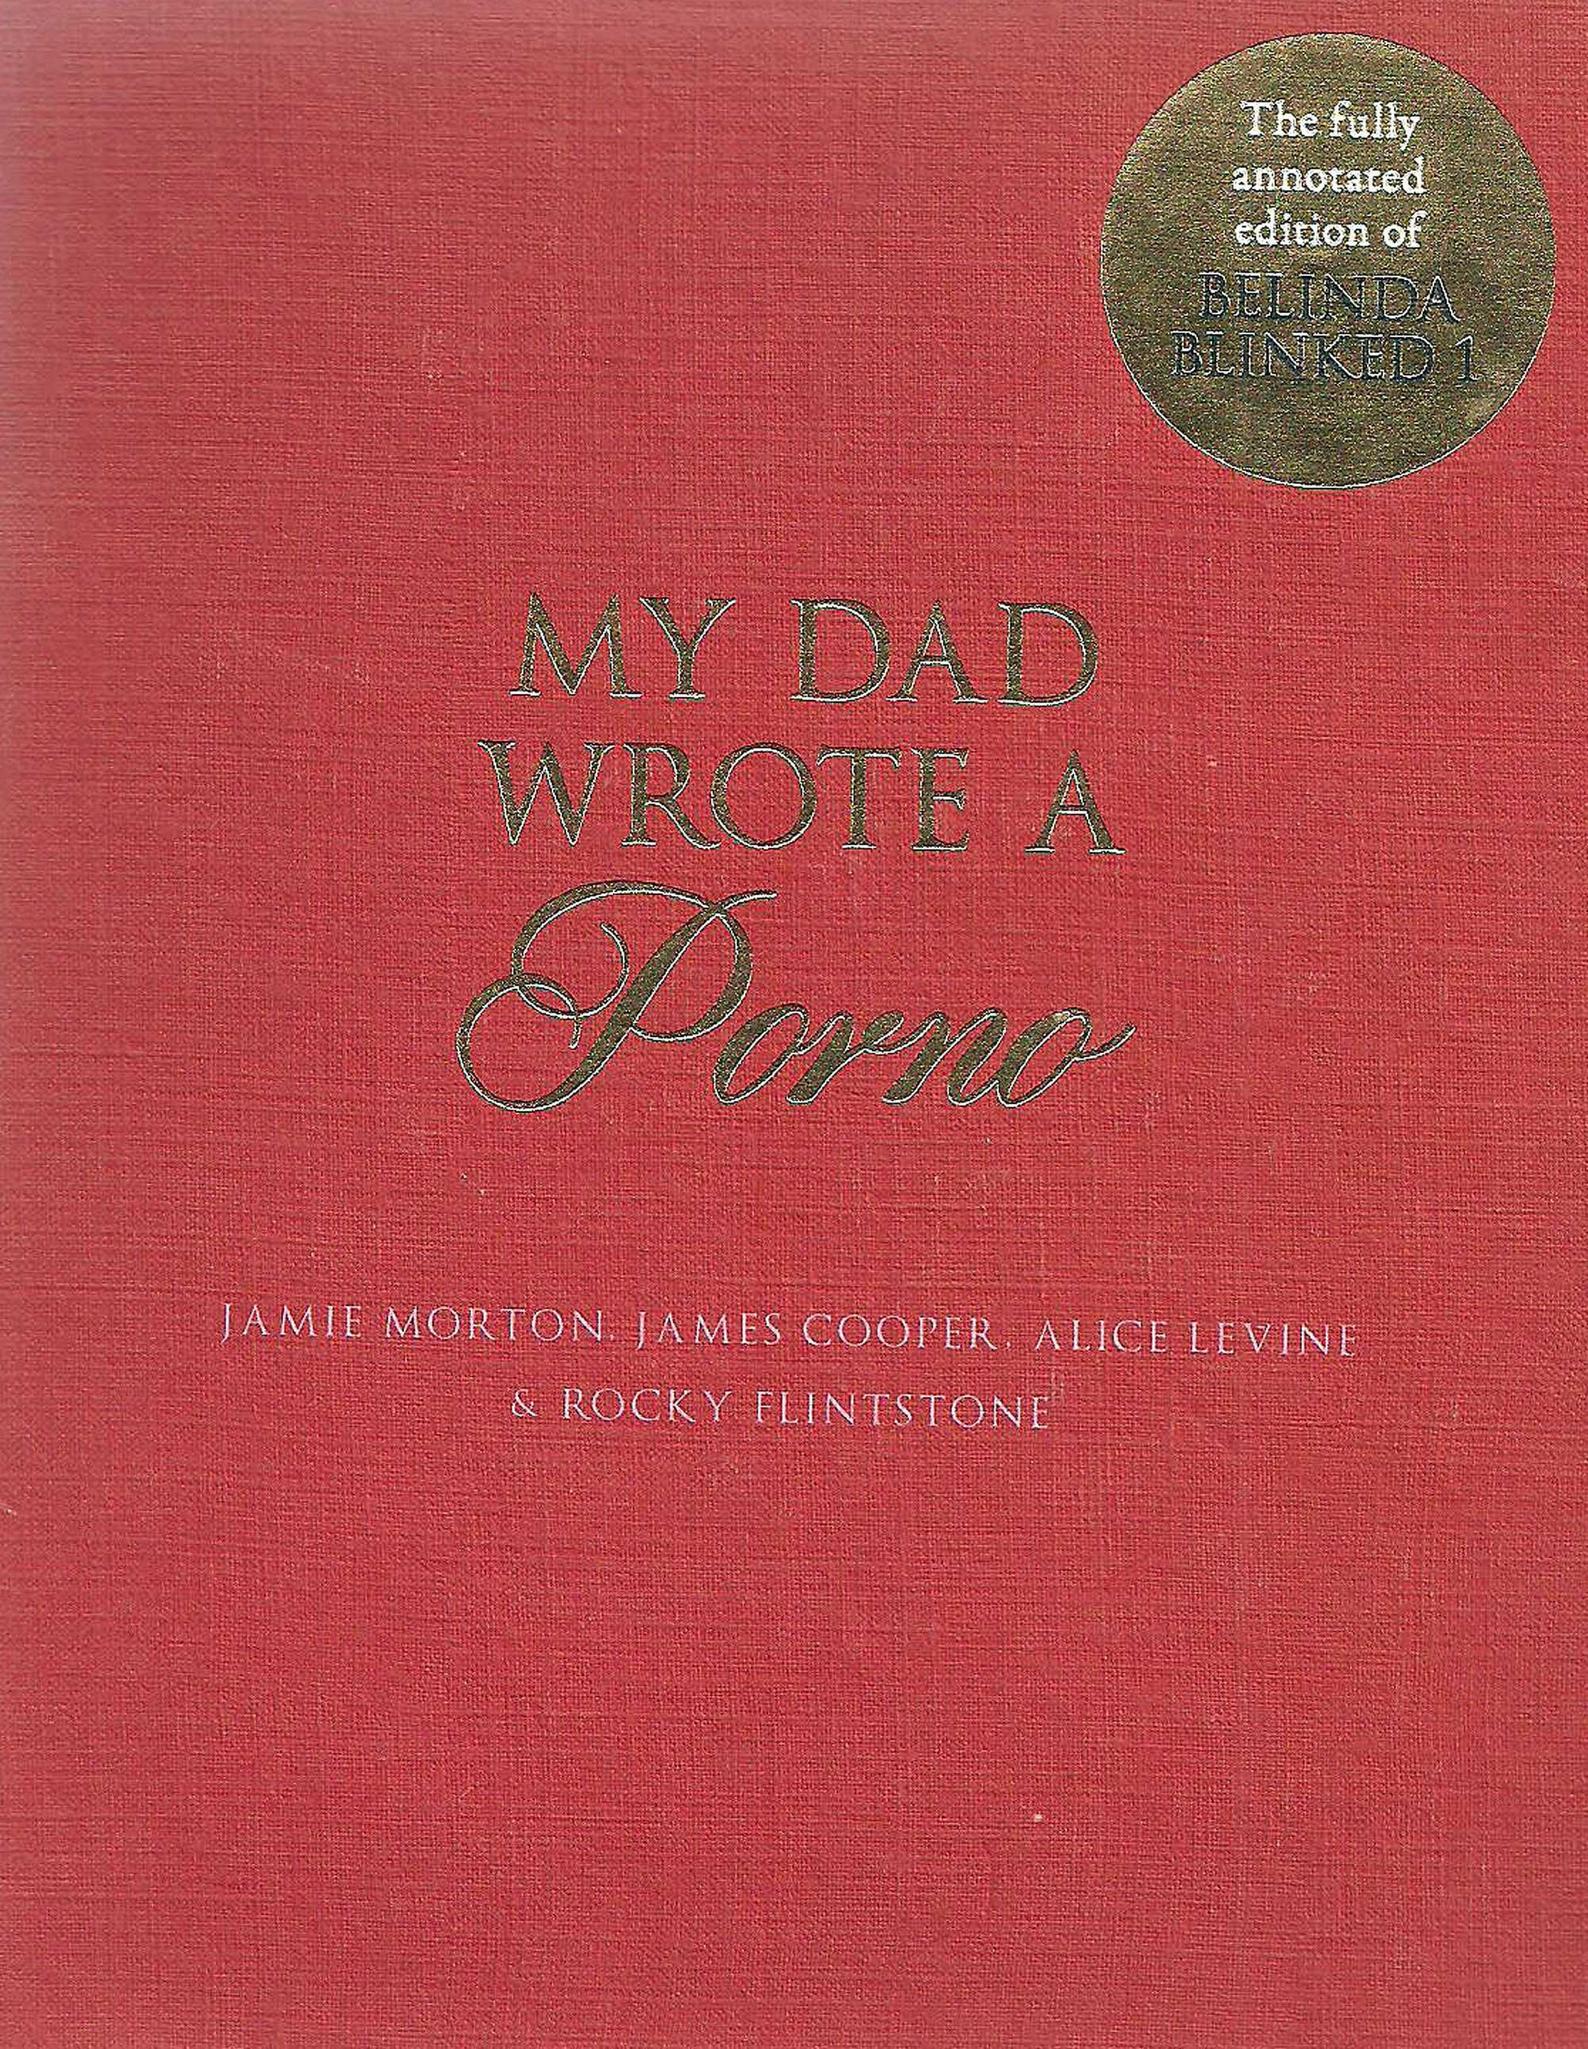 rocky flintstone author of the belinda blinked series